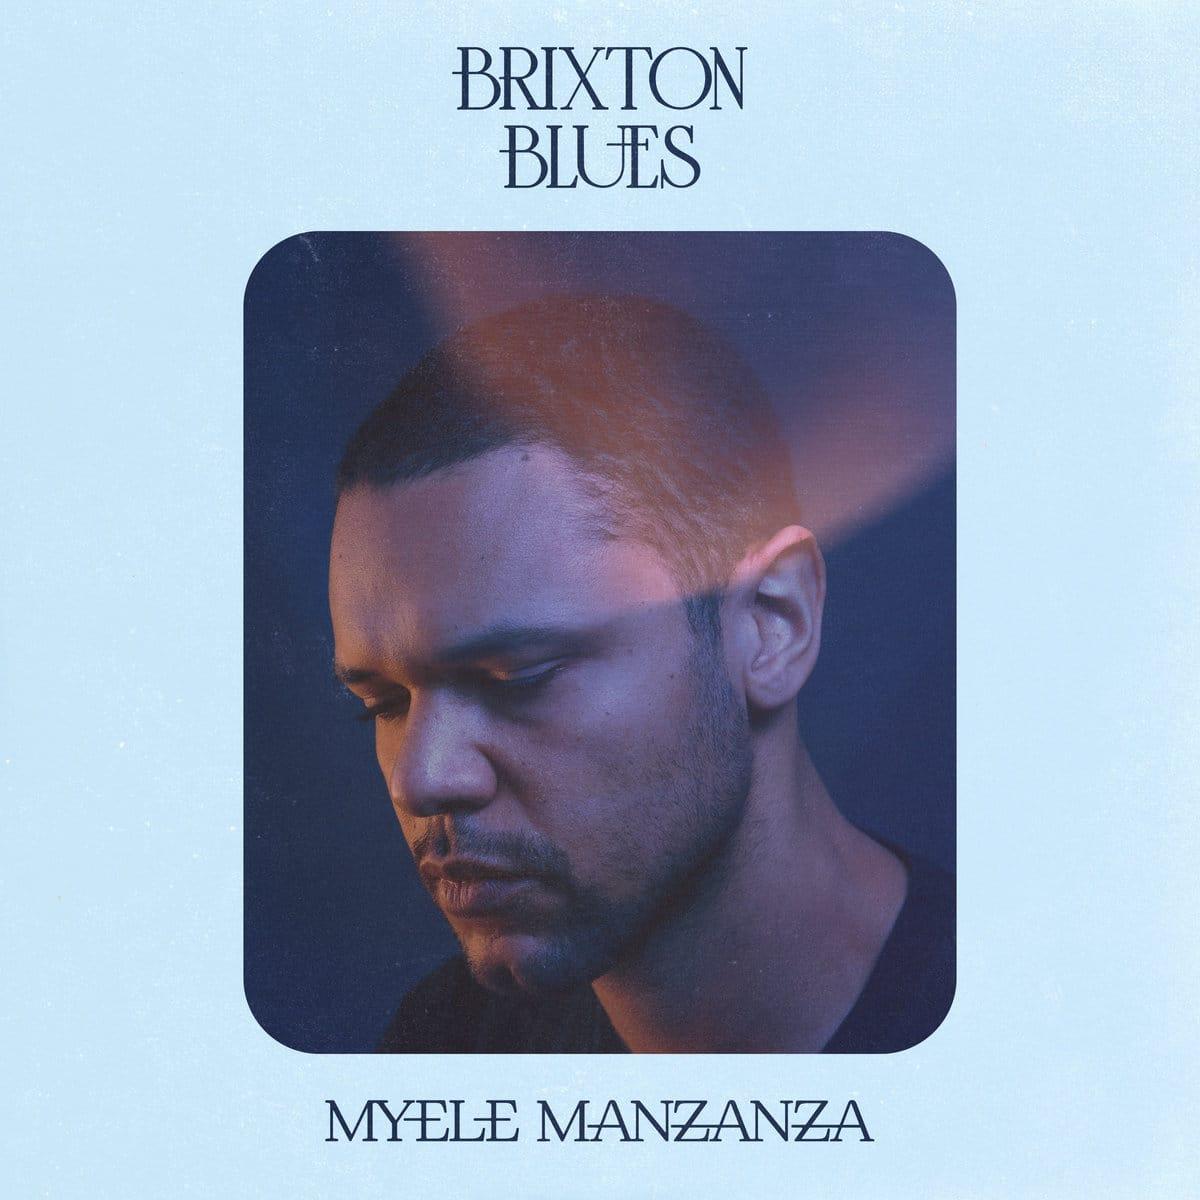 Myele Manzana Brixton Blues